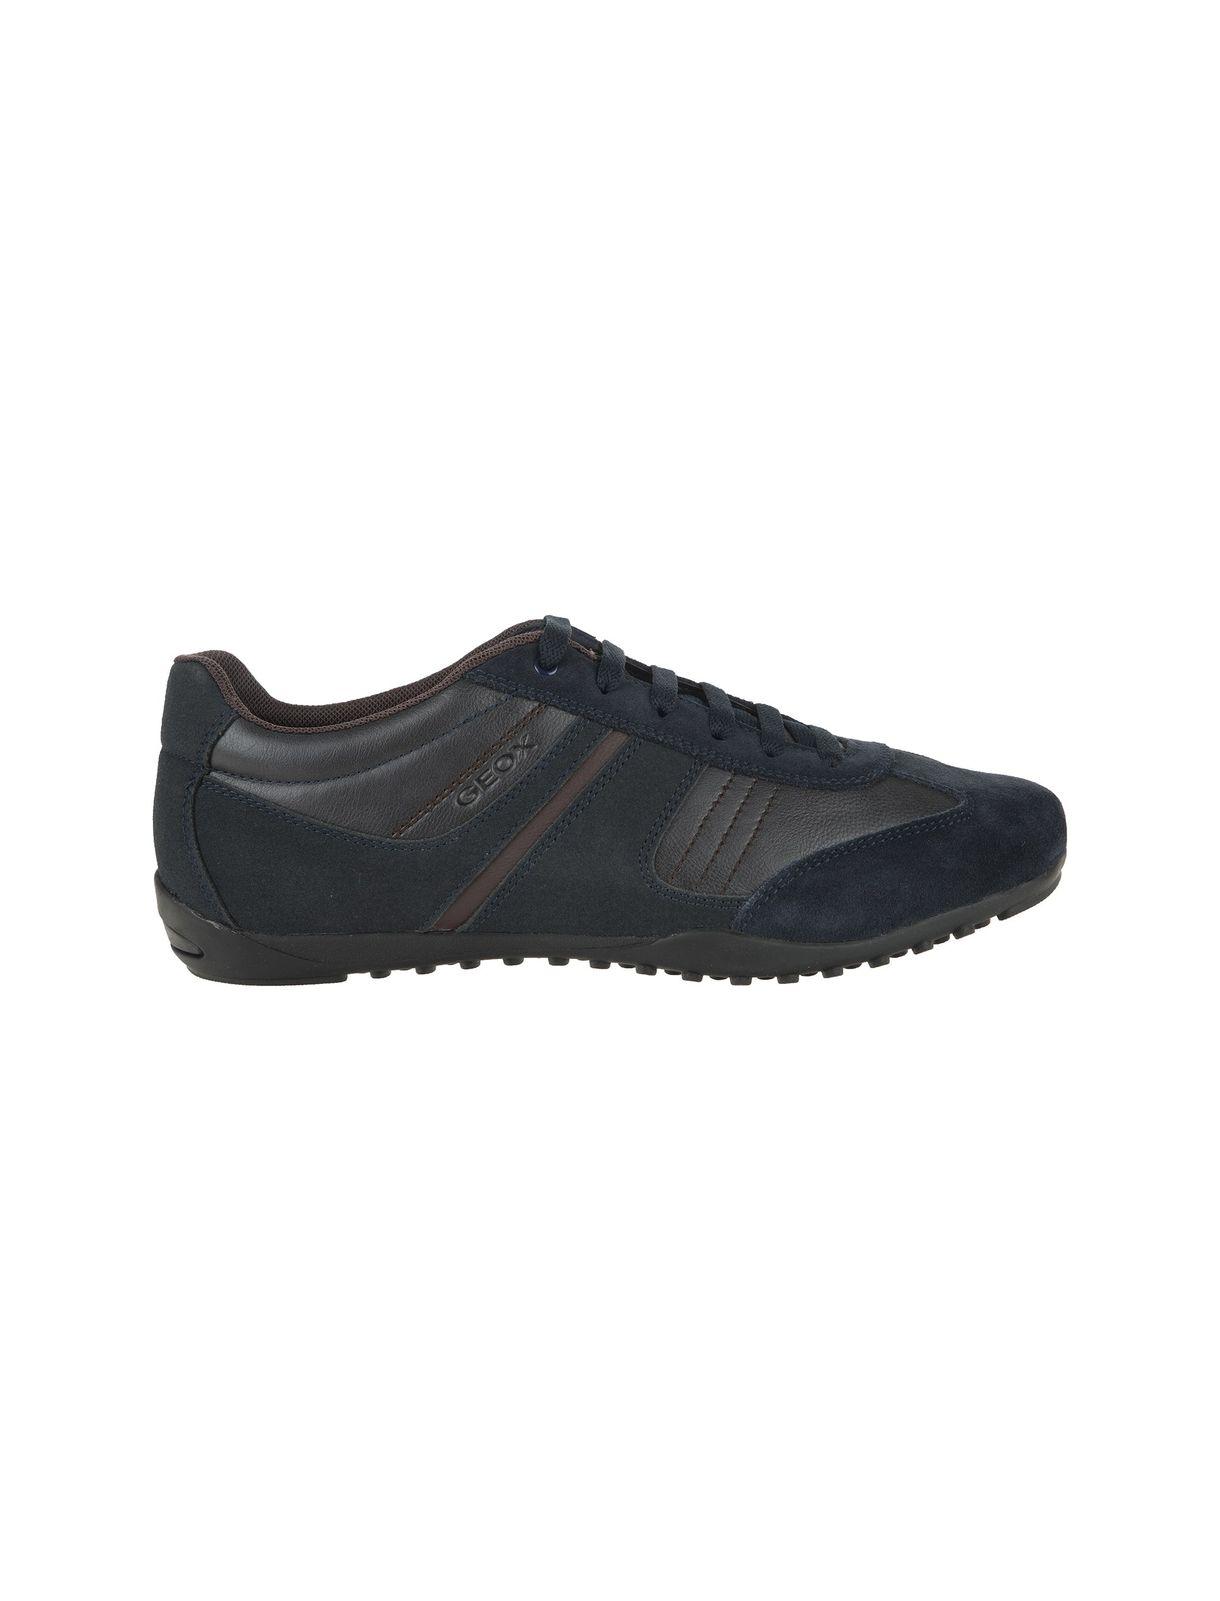 کتانی بندی مردانه U GARLAN – جی اوکس  Men Lace Up Sneakers U GARLAN – Geox